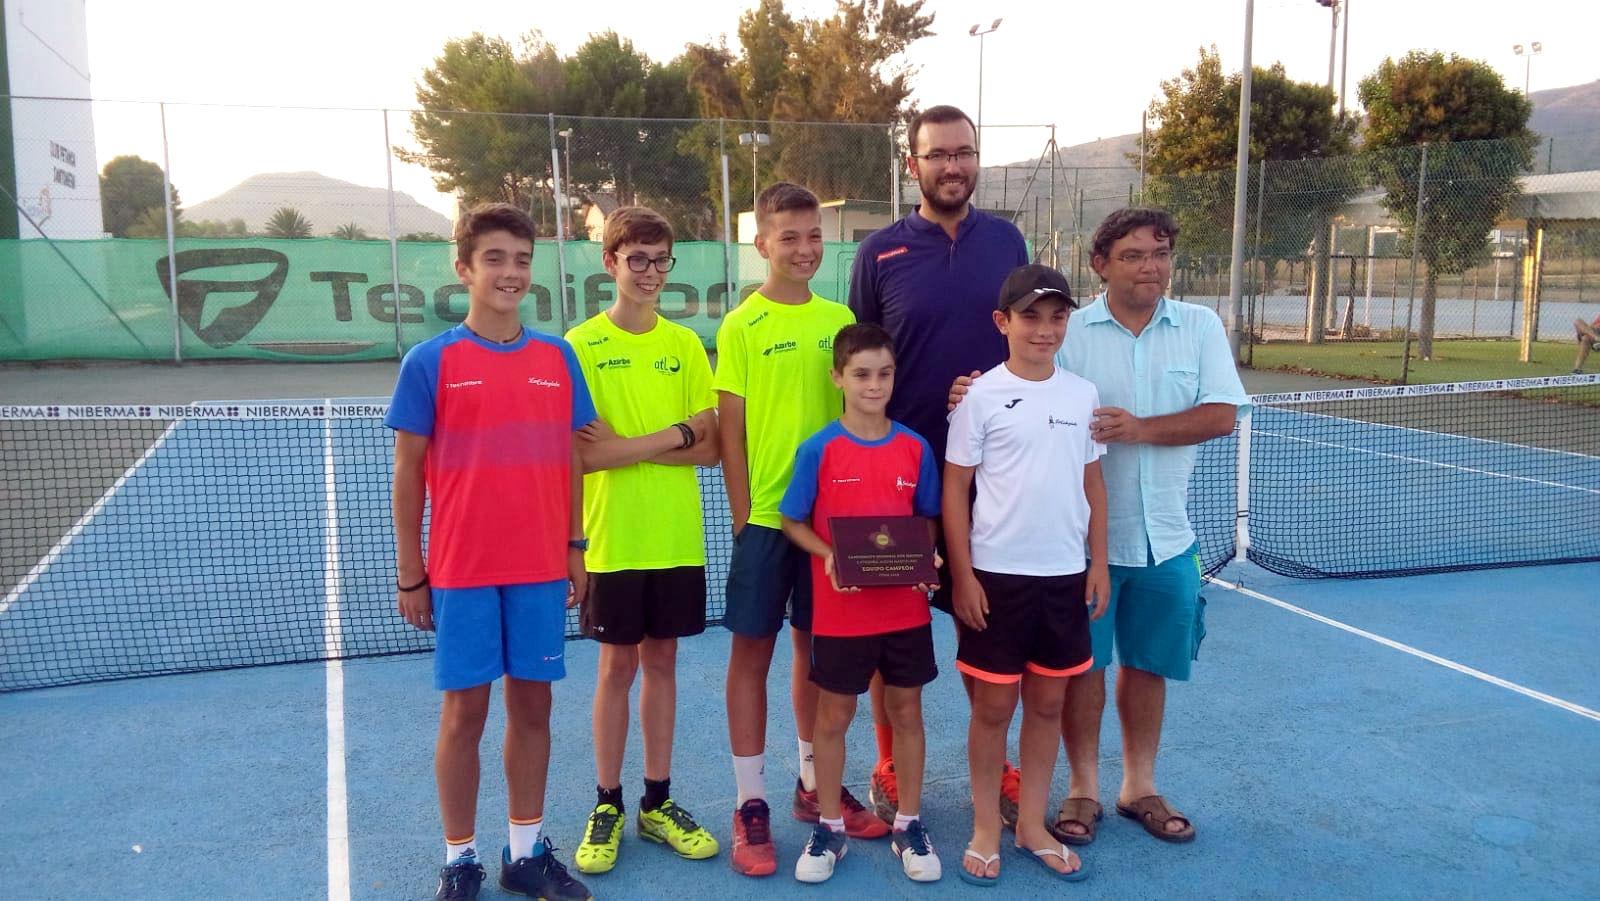 Equipo alevin masculino tenis, campeon regional